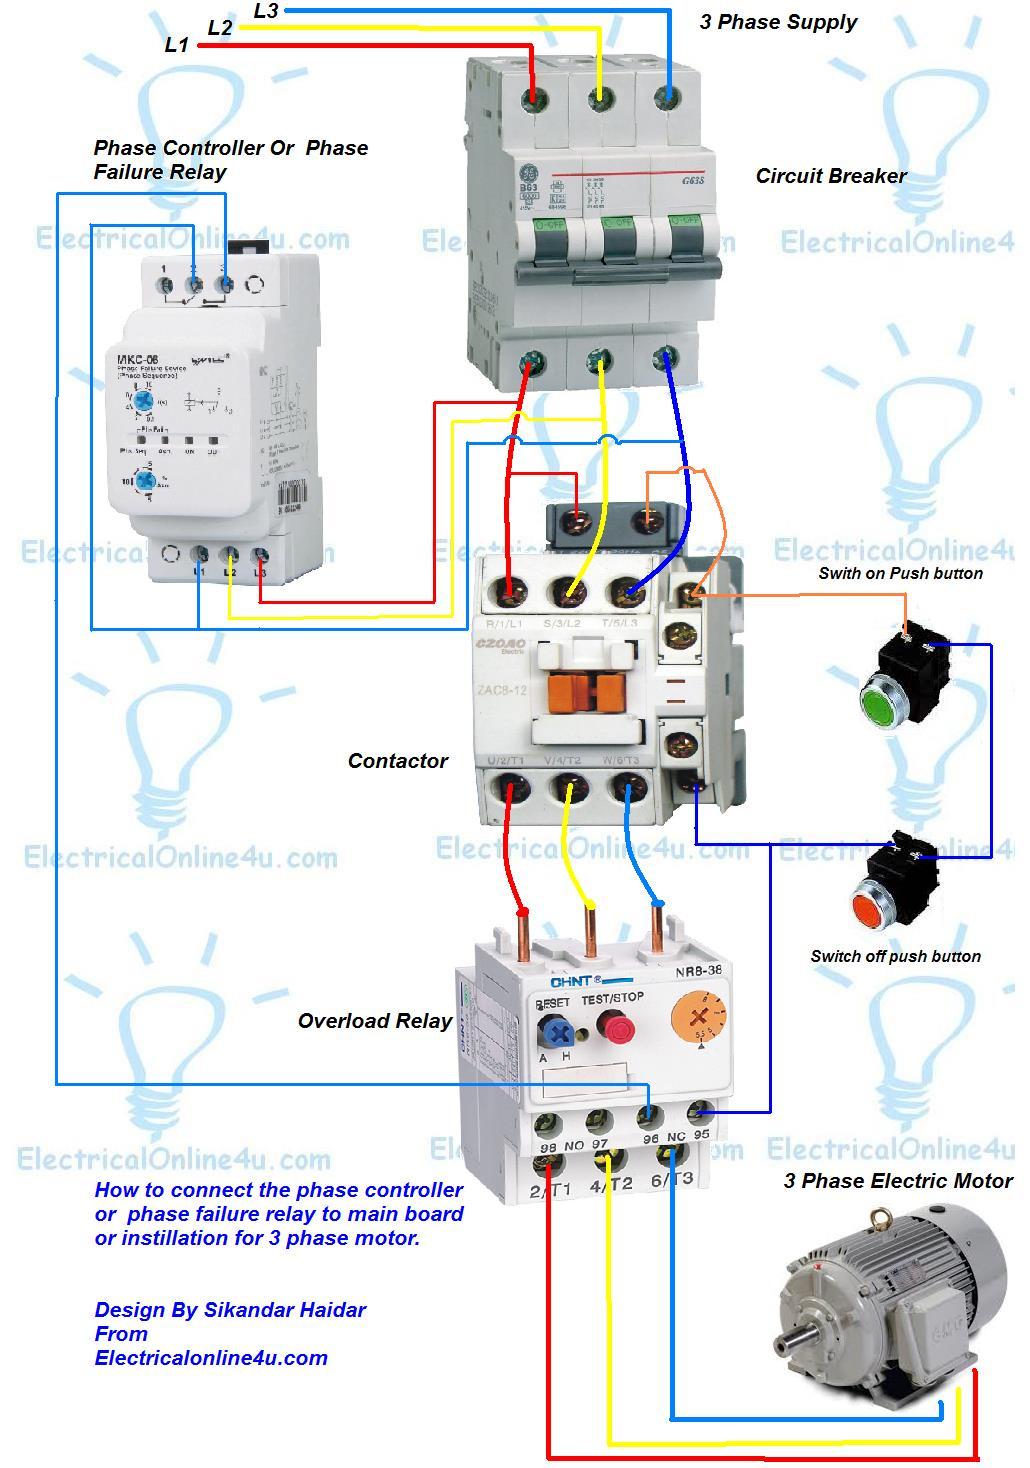 3 phase motor wiring diagram 120 volt control wiring diagram 3 phase motor wiring diagram 120 volt control [ 1030 x 1468 Pixel ]